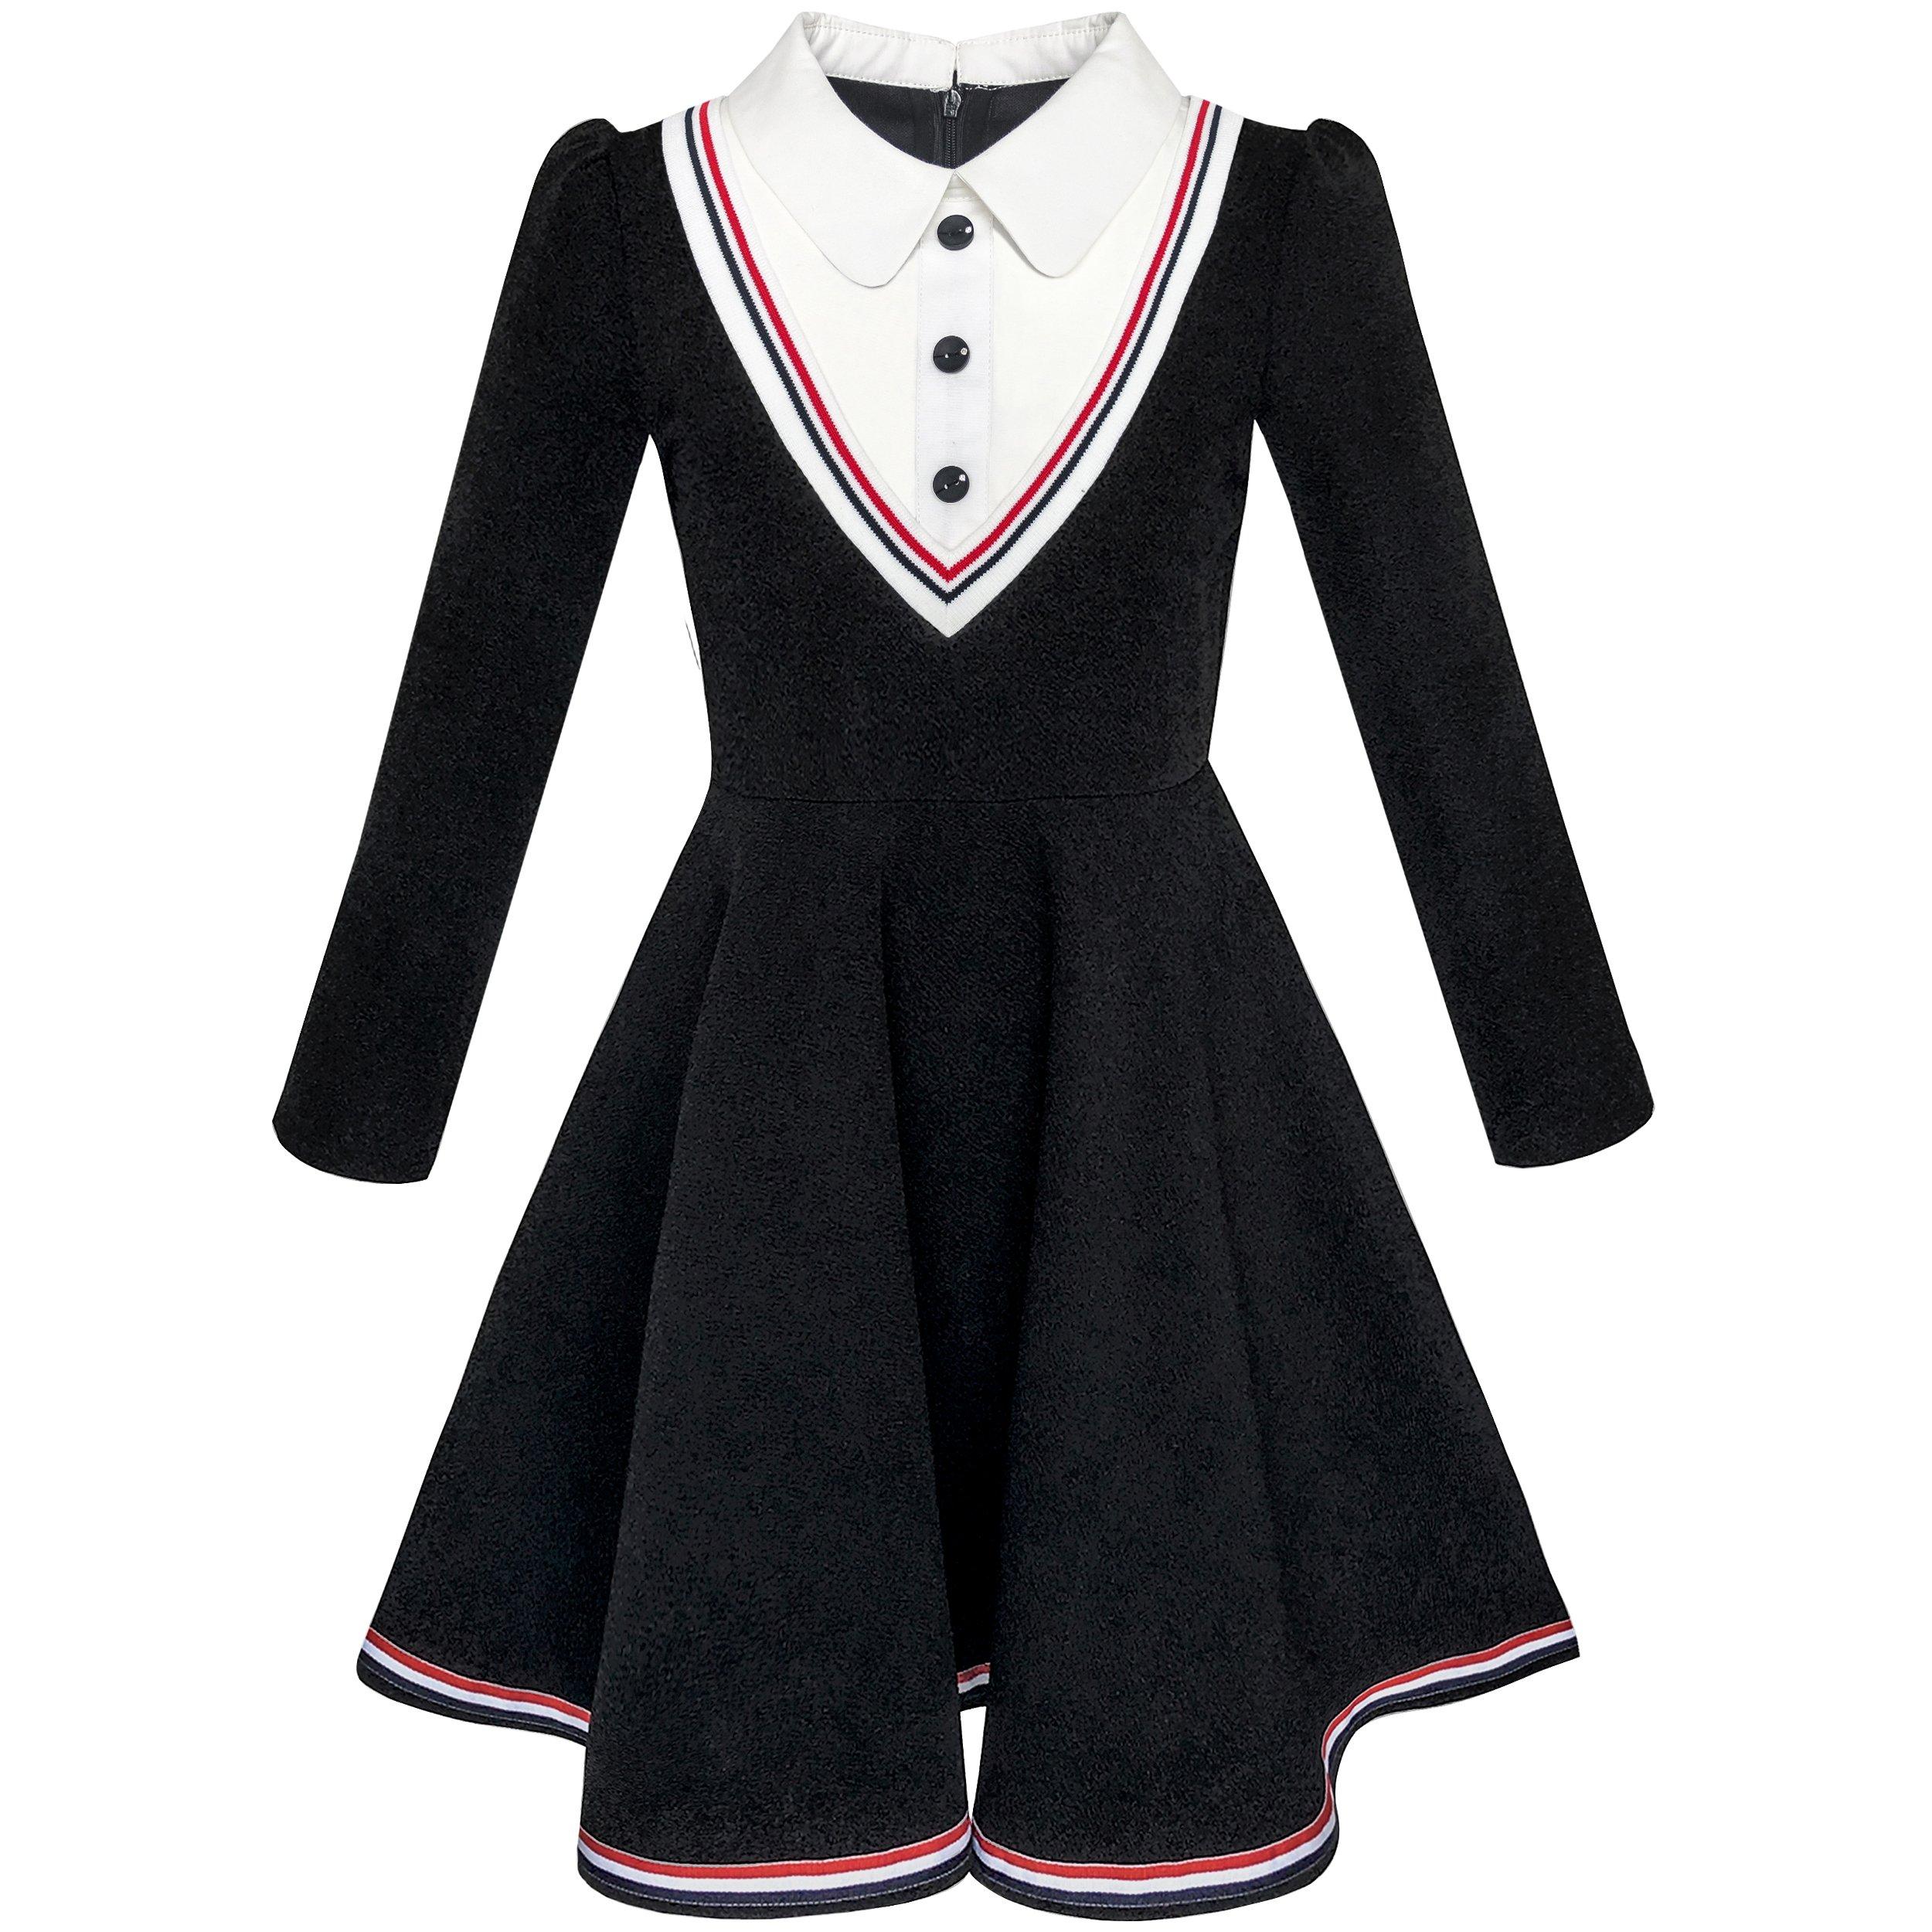 Sunny Fashion KM92 Girls Dress School White Collar Long Sleeve Striped Size 5